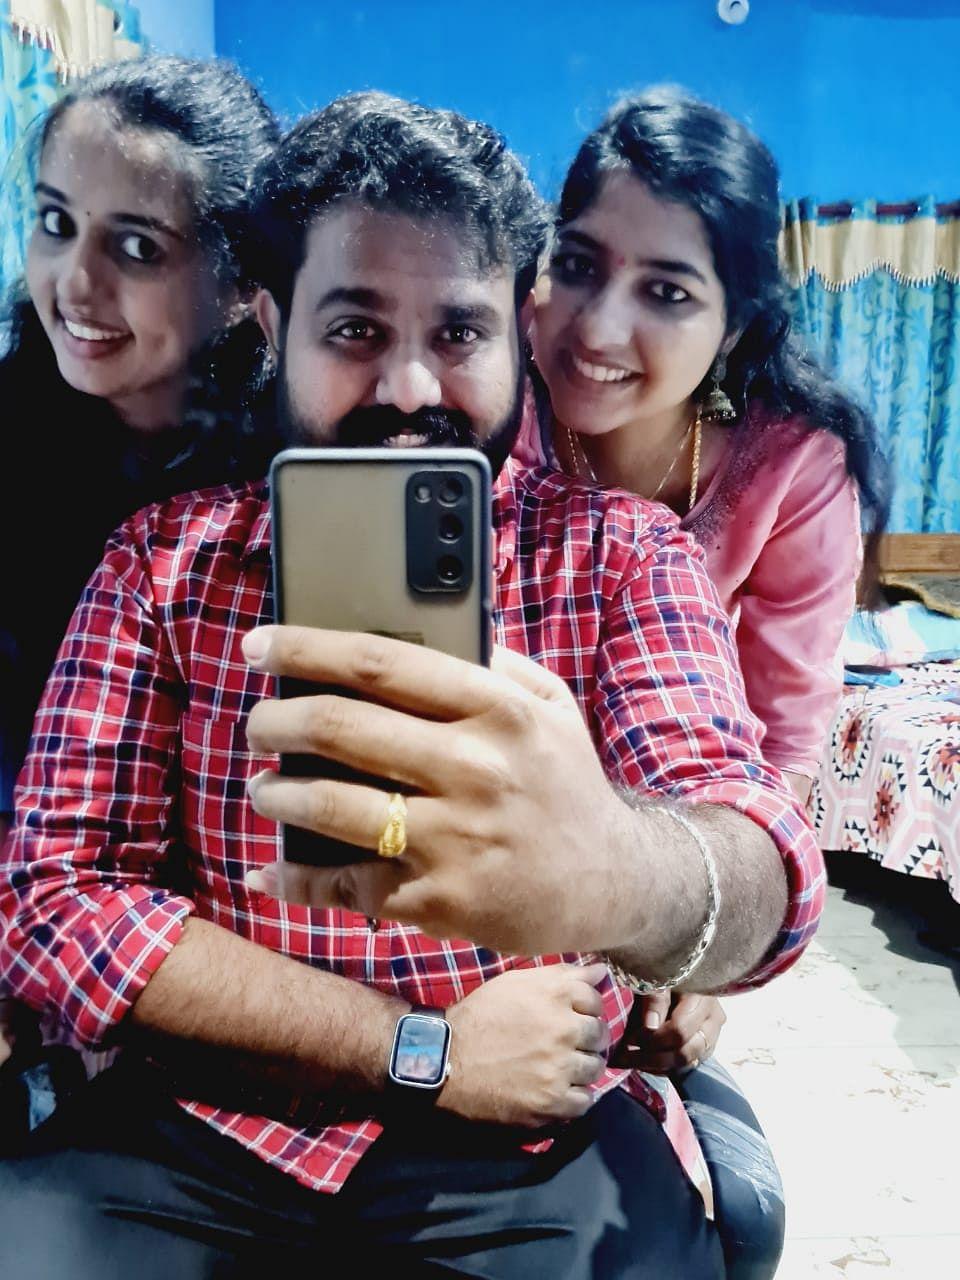 Vismaya V Nair (left) with her brother Vijith V Nair and sister-in-law Revathi.